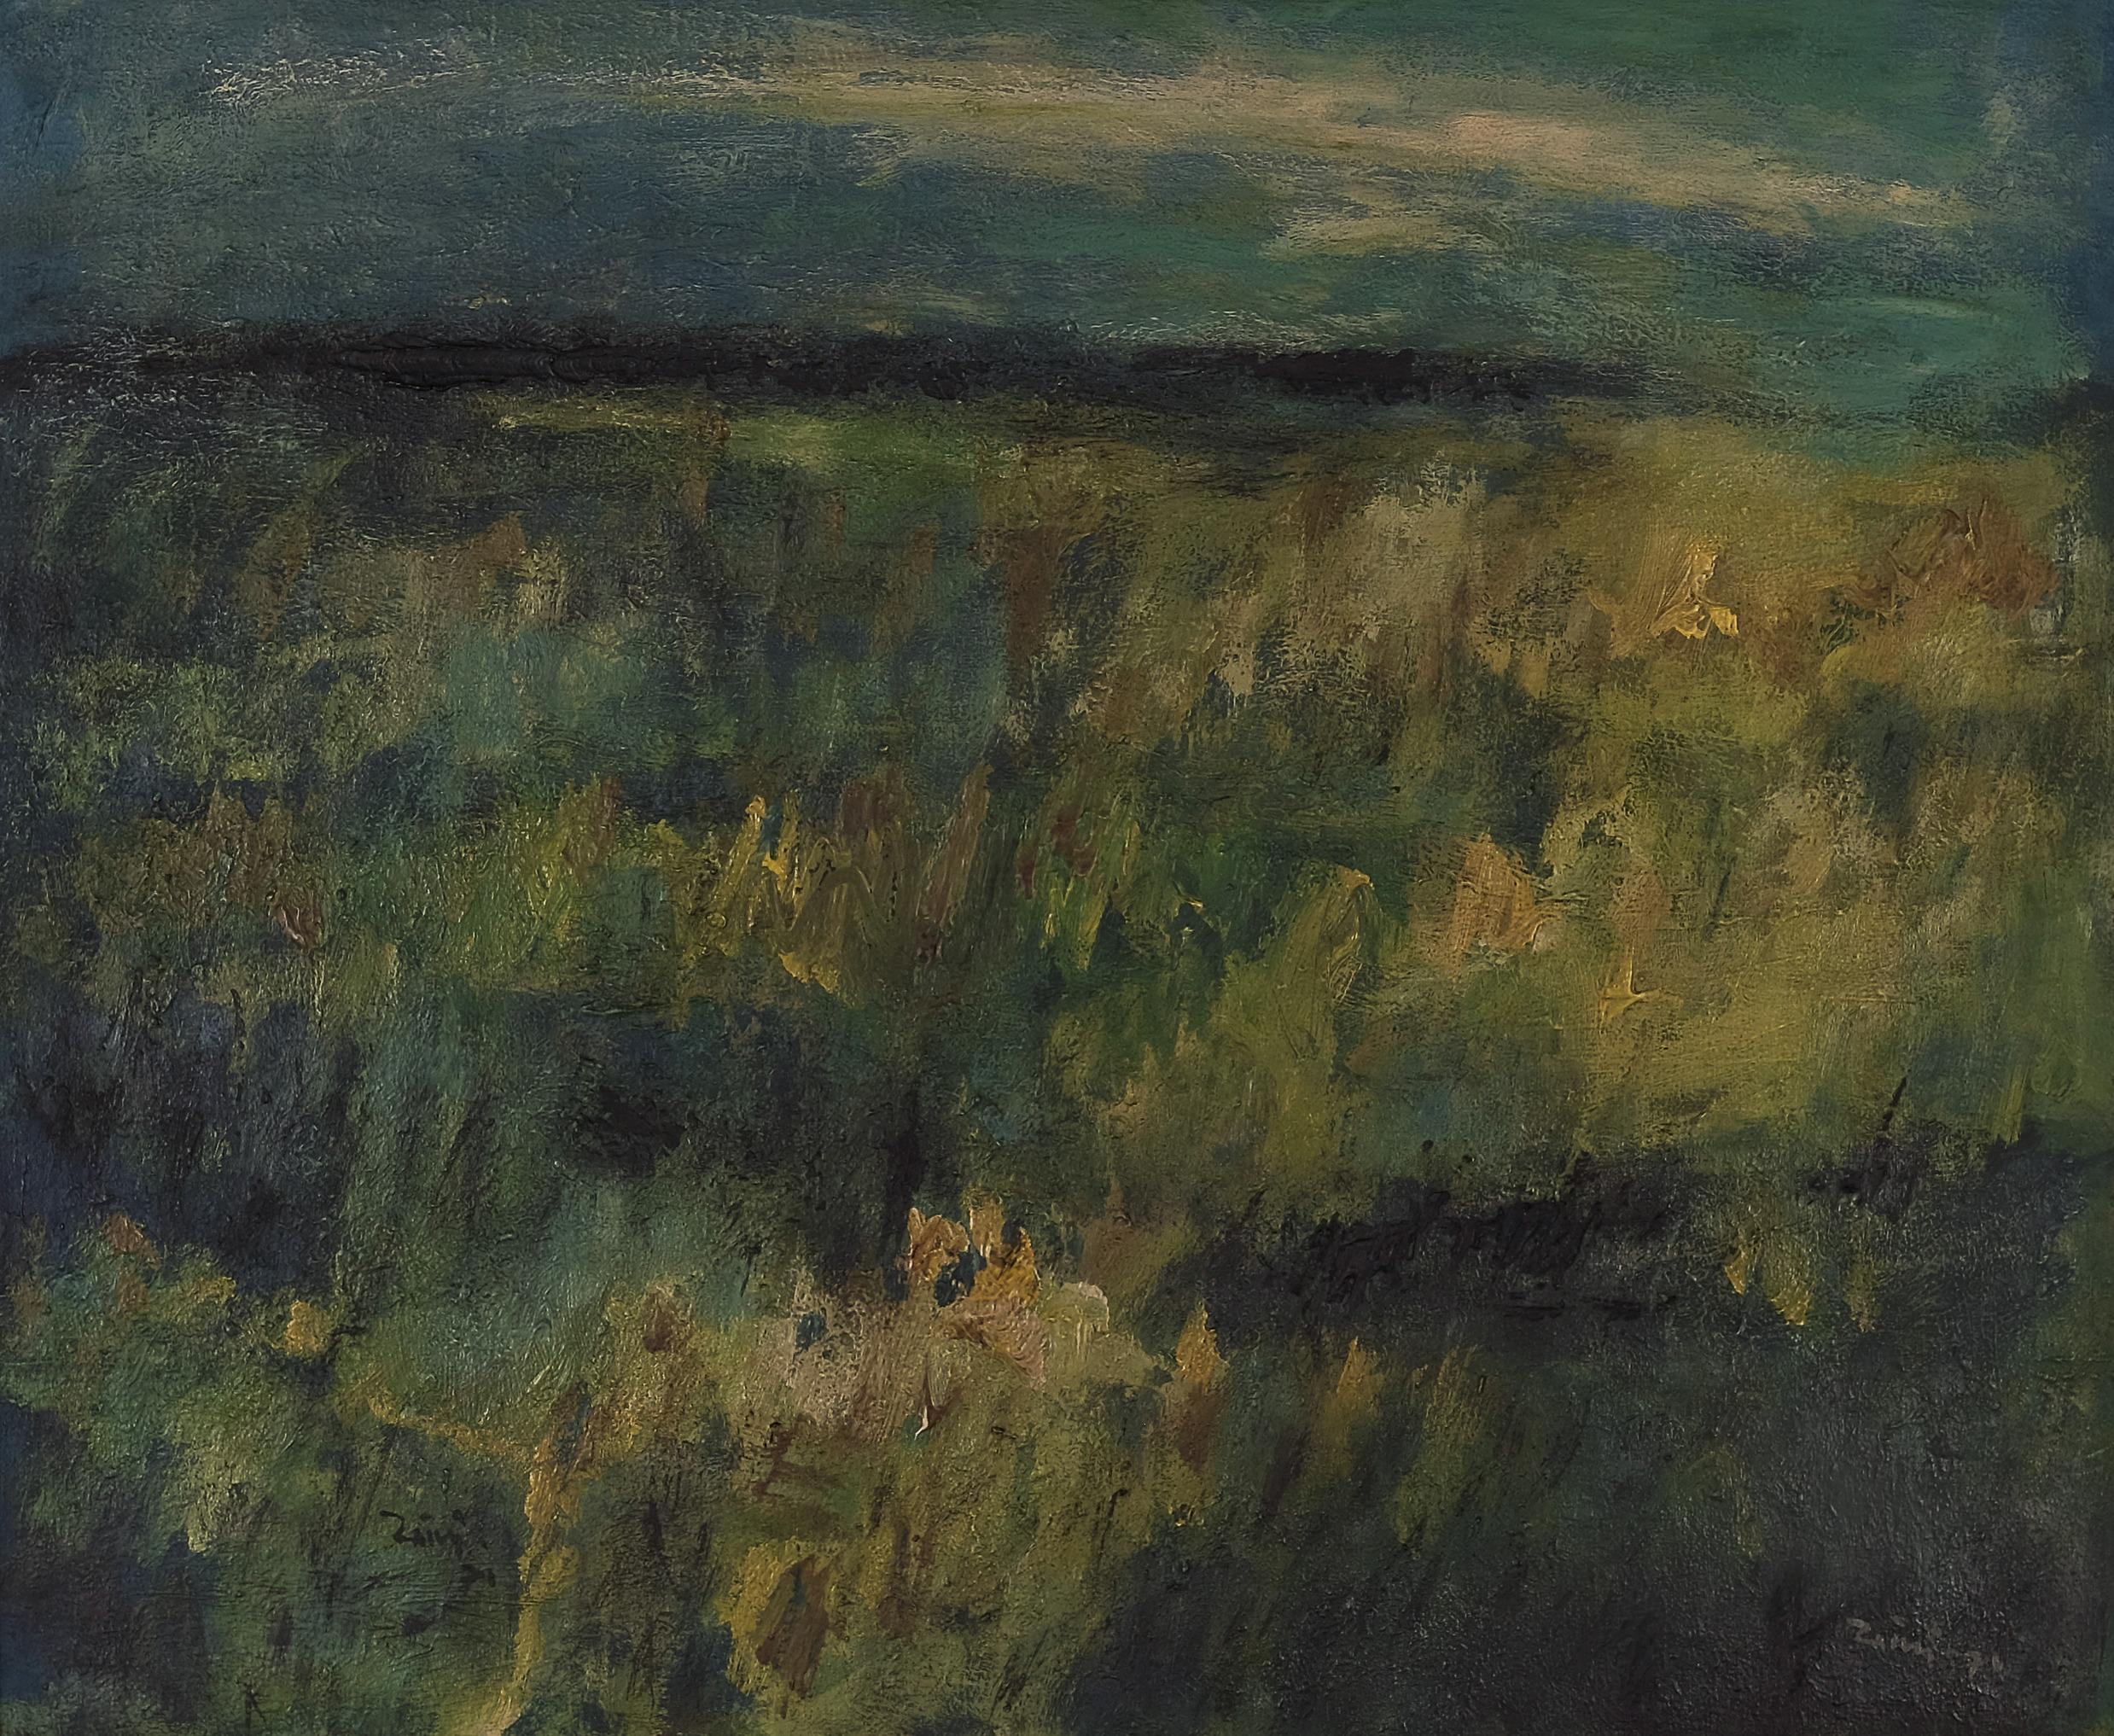 Zaini, Padang Rumput (Open Field), oil on canvas, 50.5 x 60